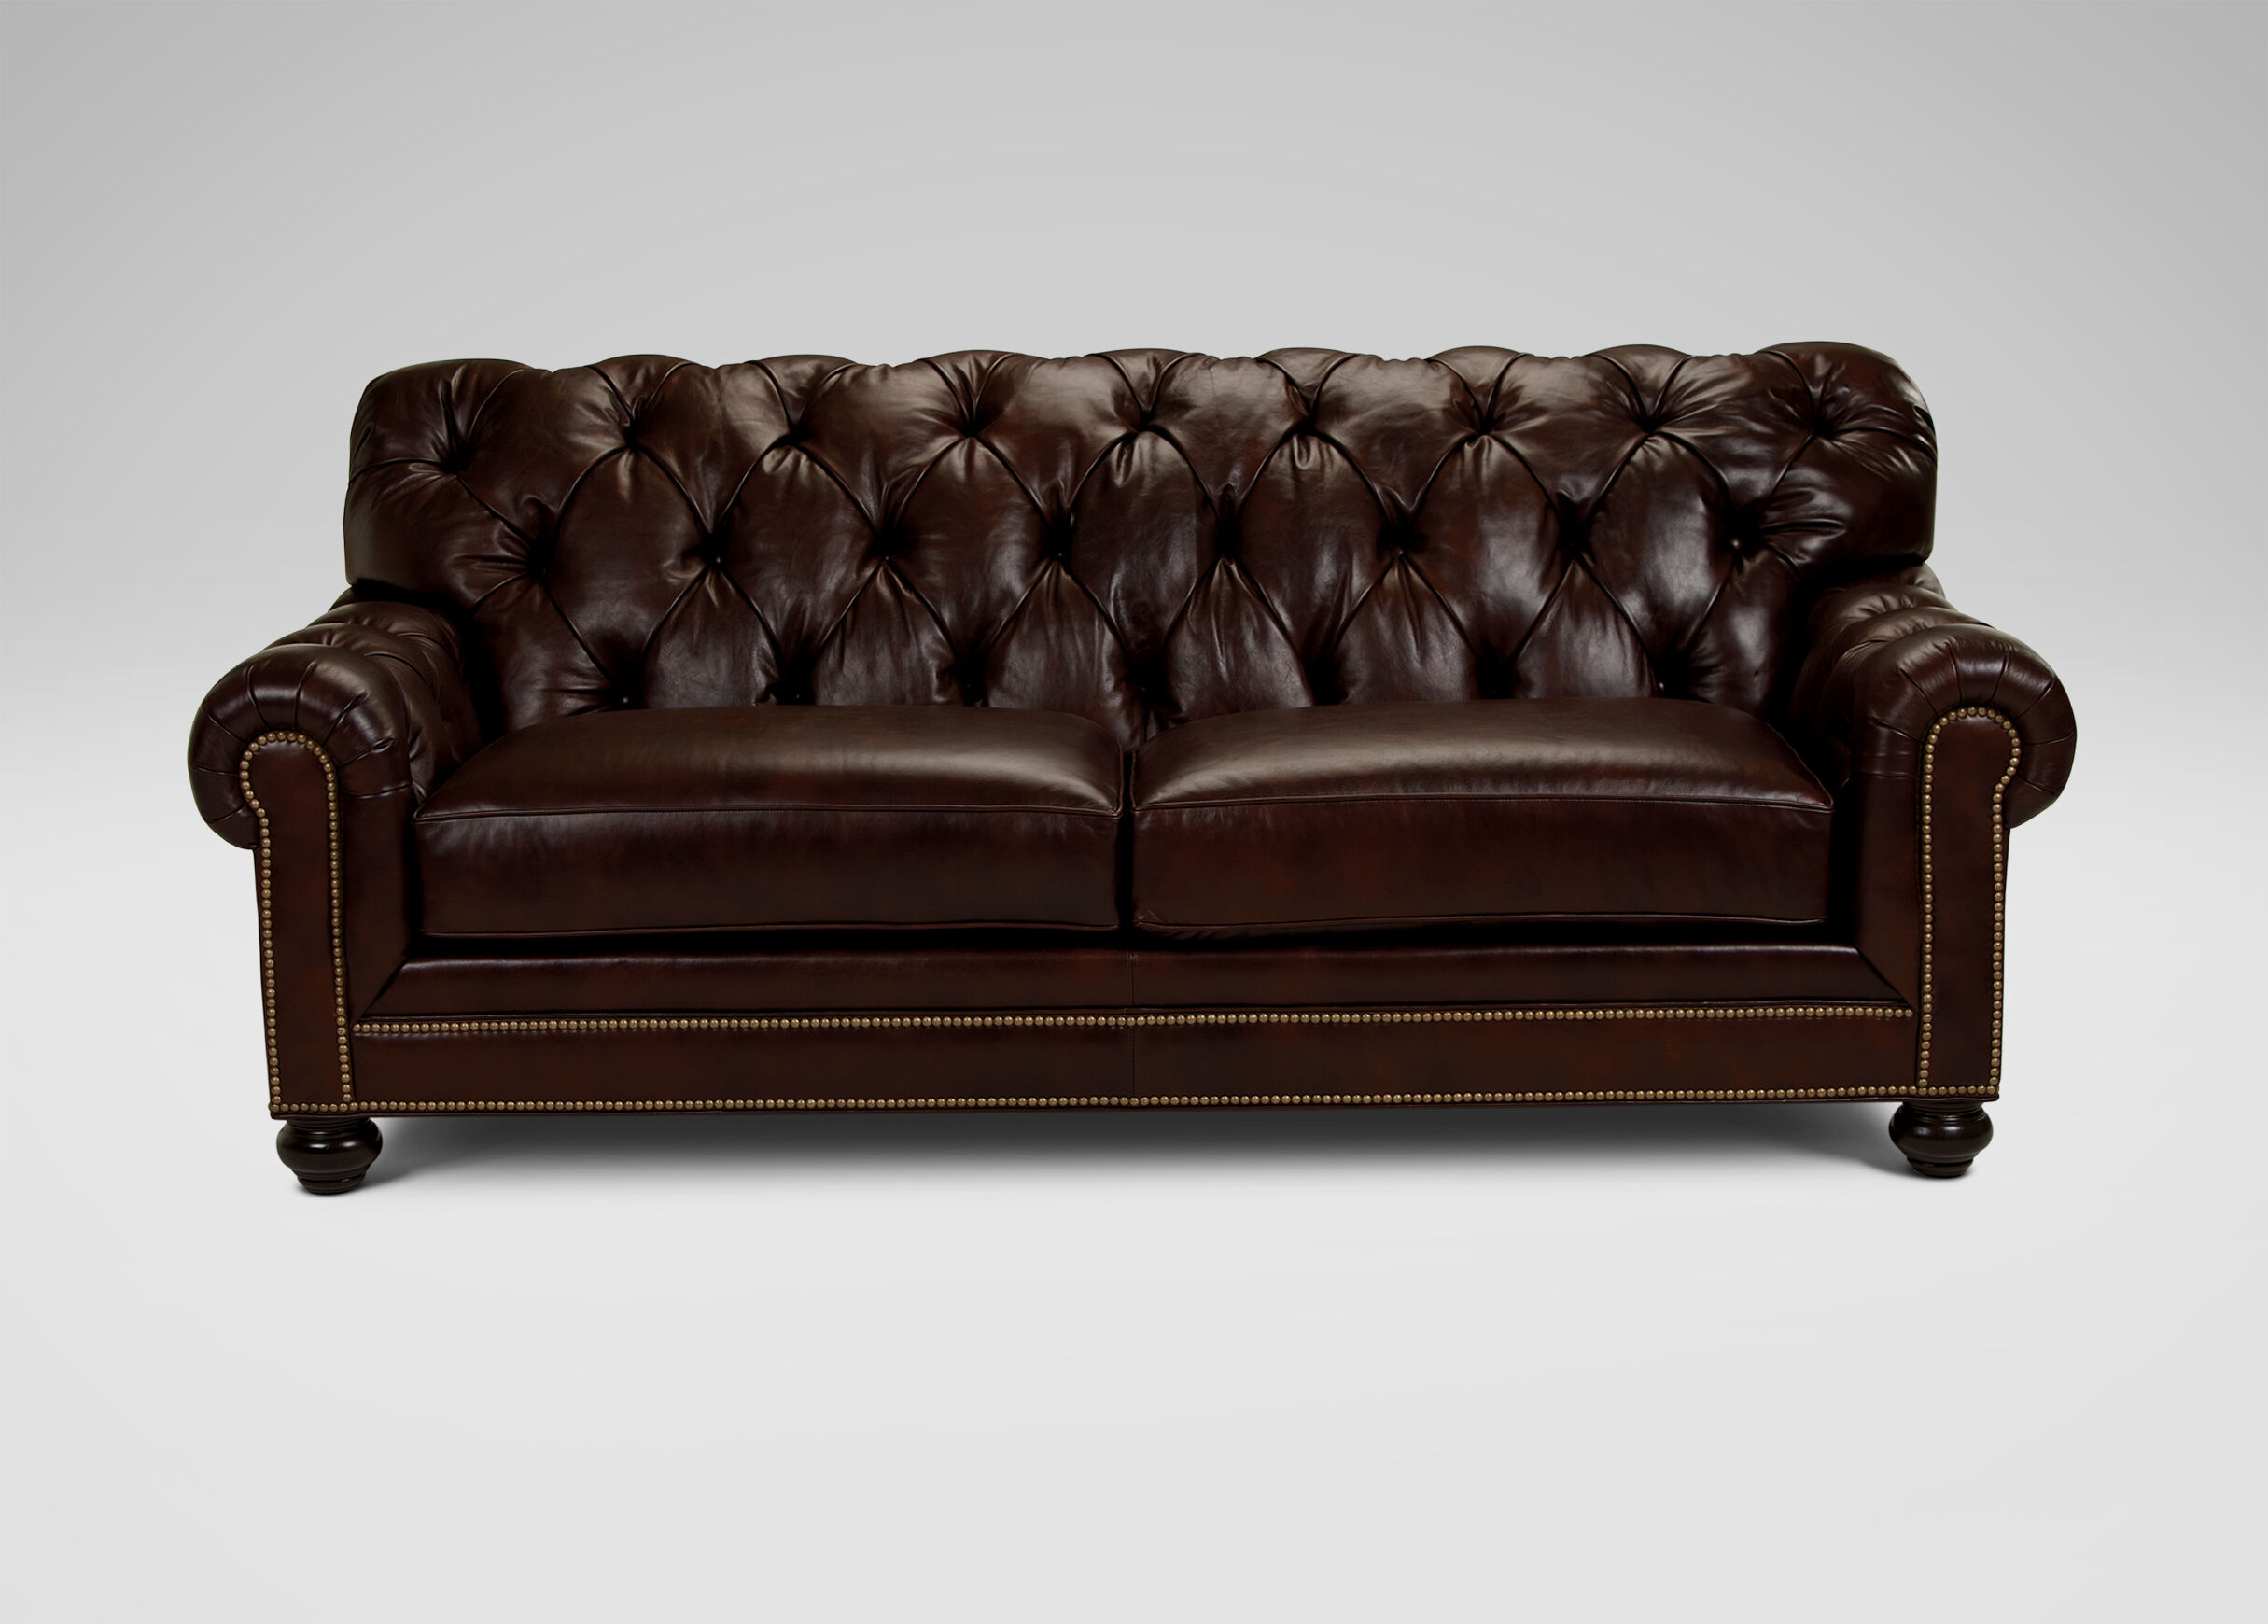 chadwick sofa compact bed canada modular seating lounge herman